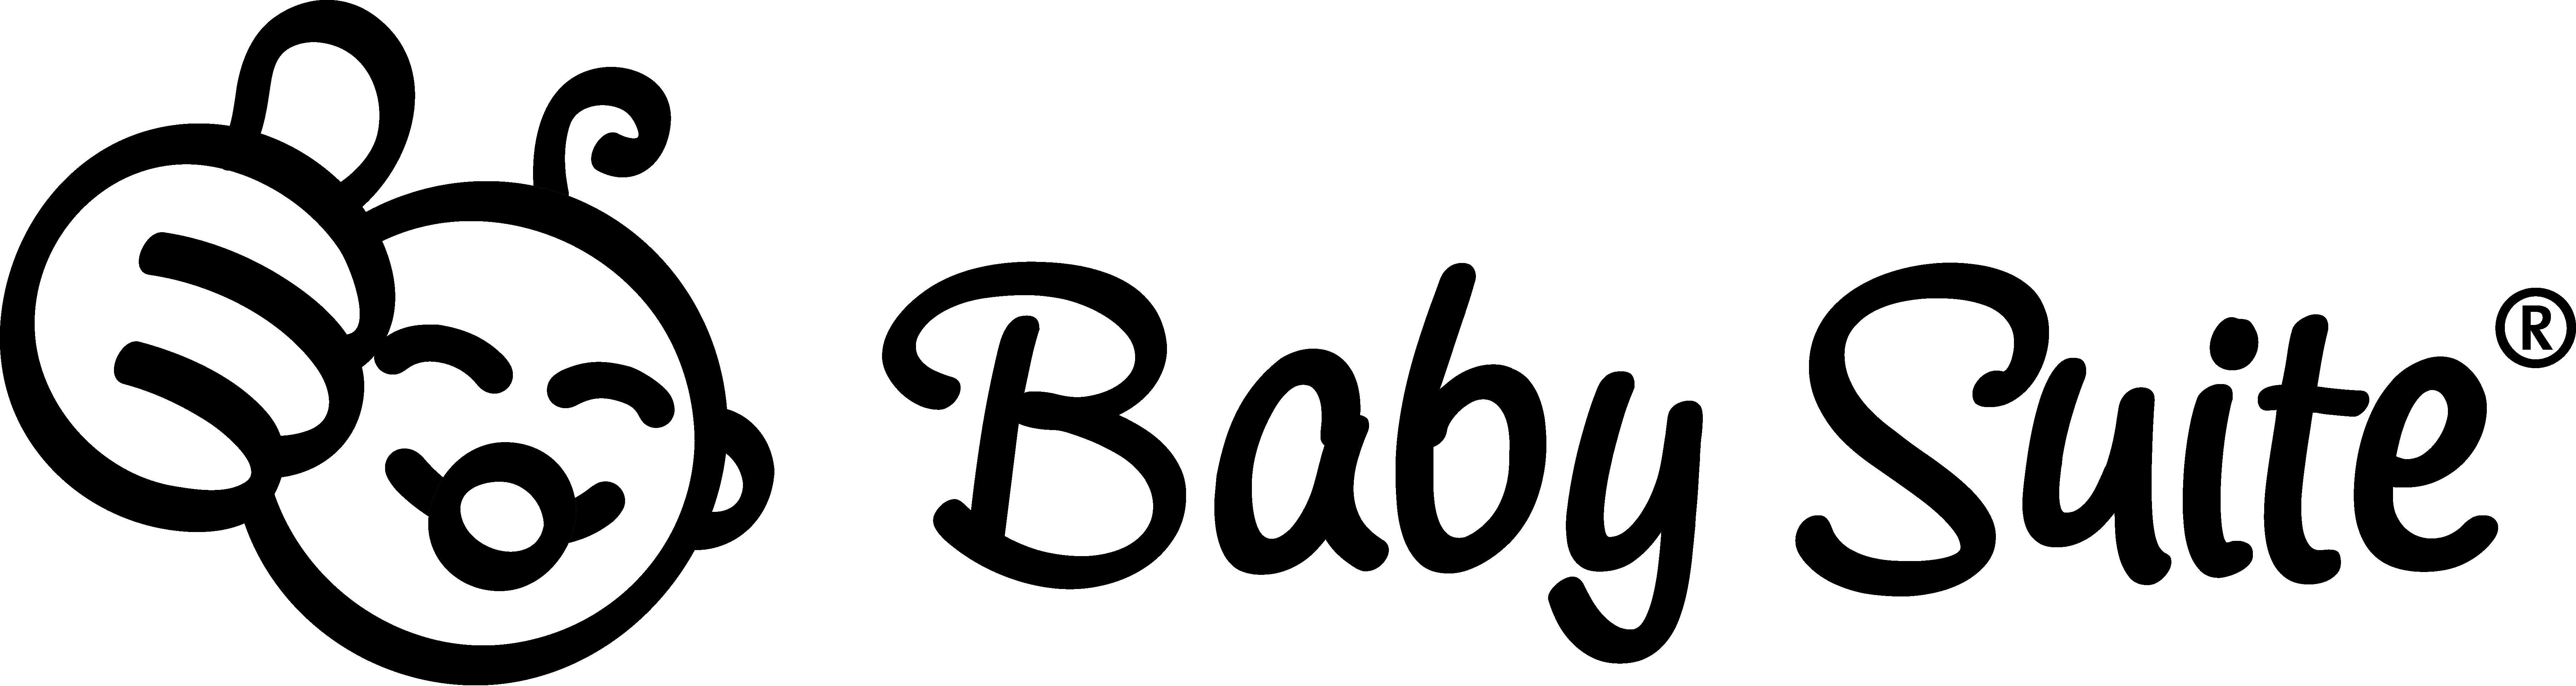 logotip fosc